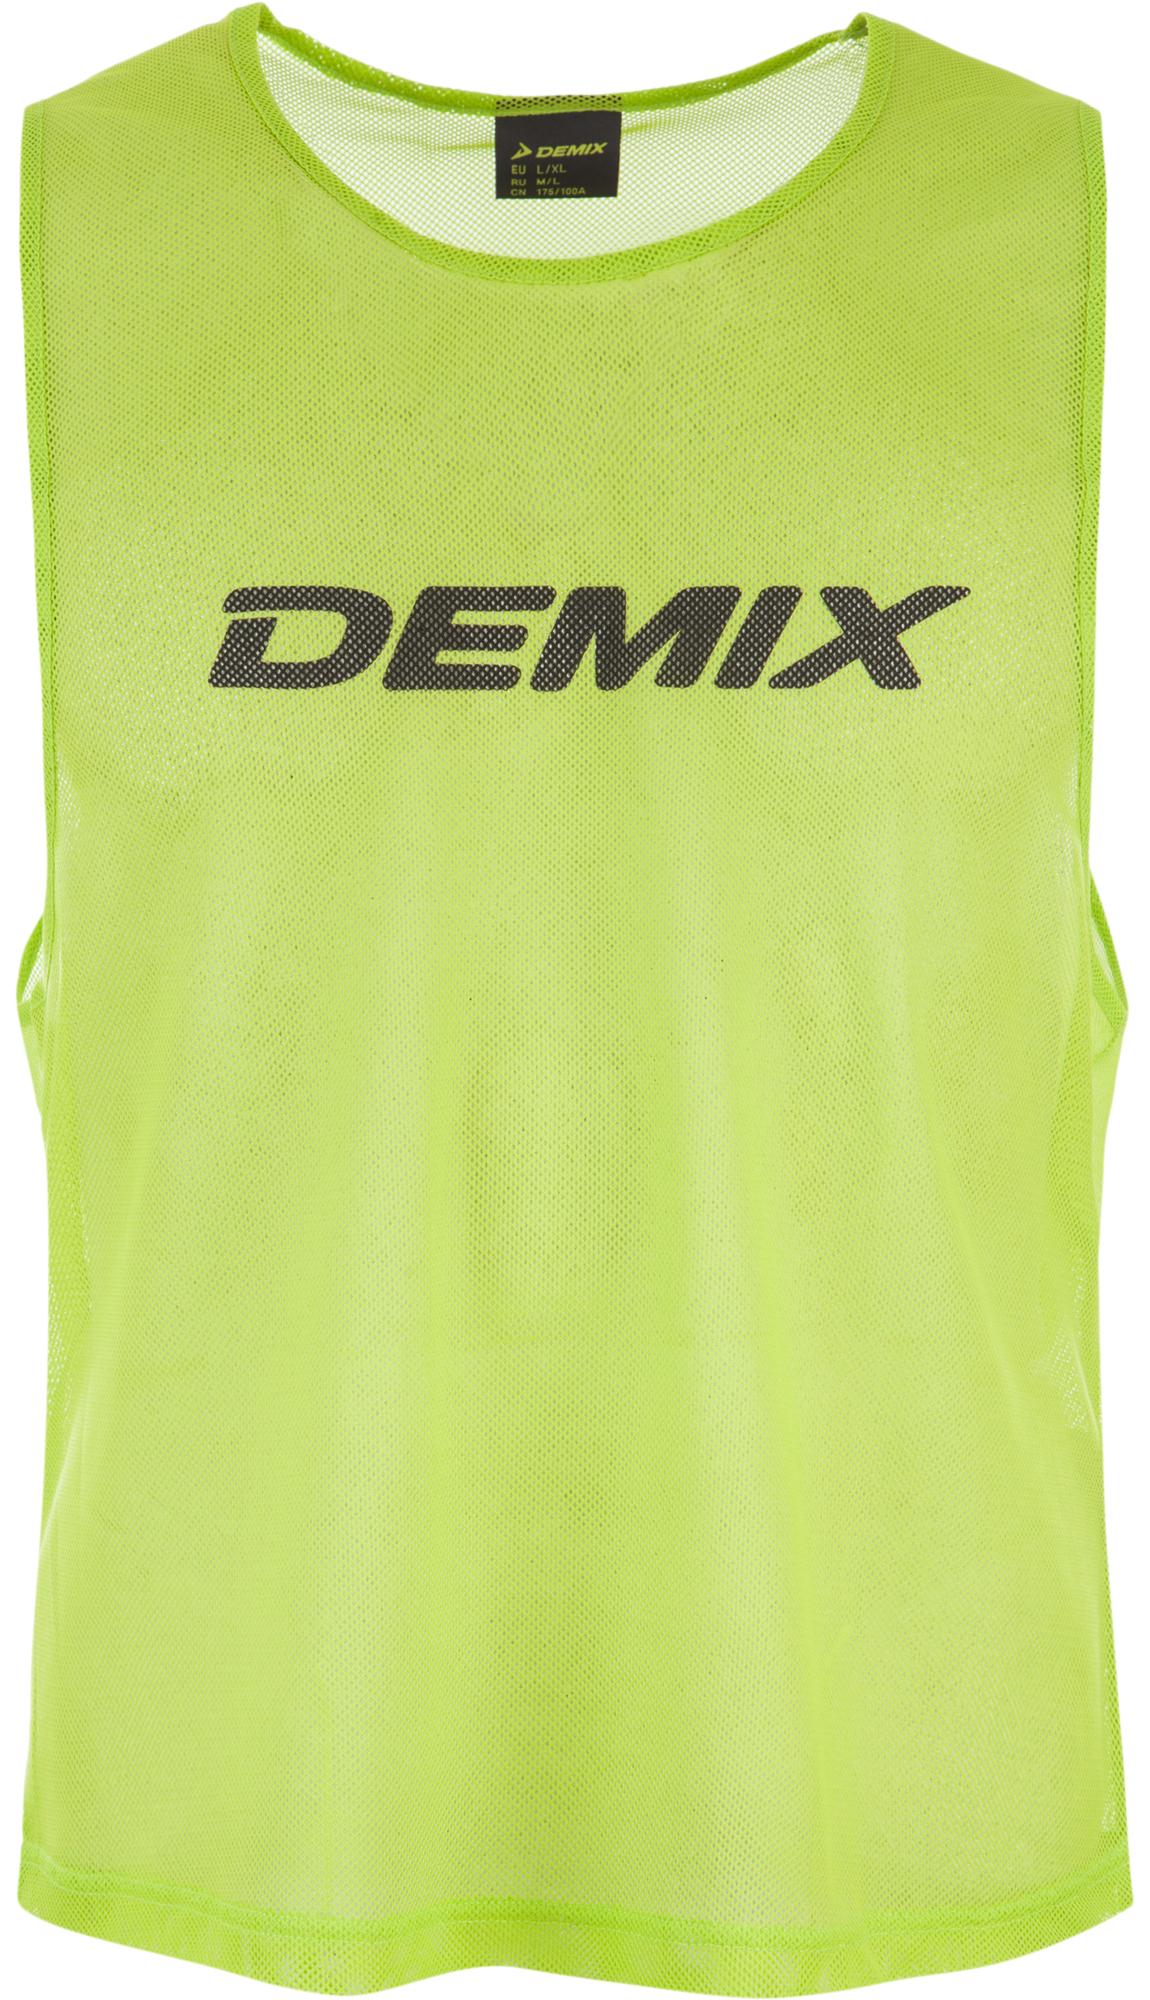 Demix Манишка Demix, размер 48-50 tchui свободный размер